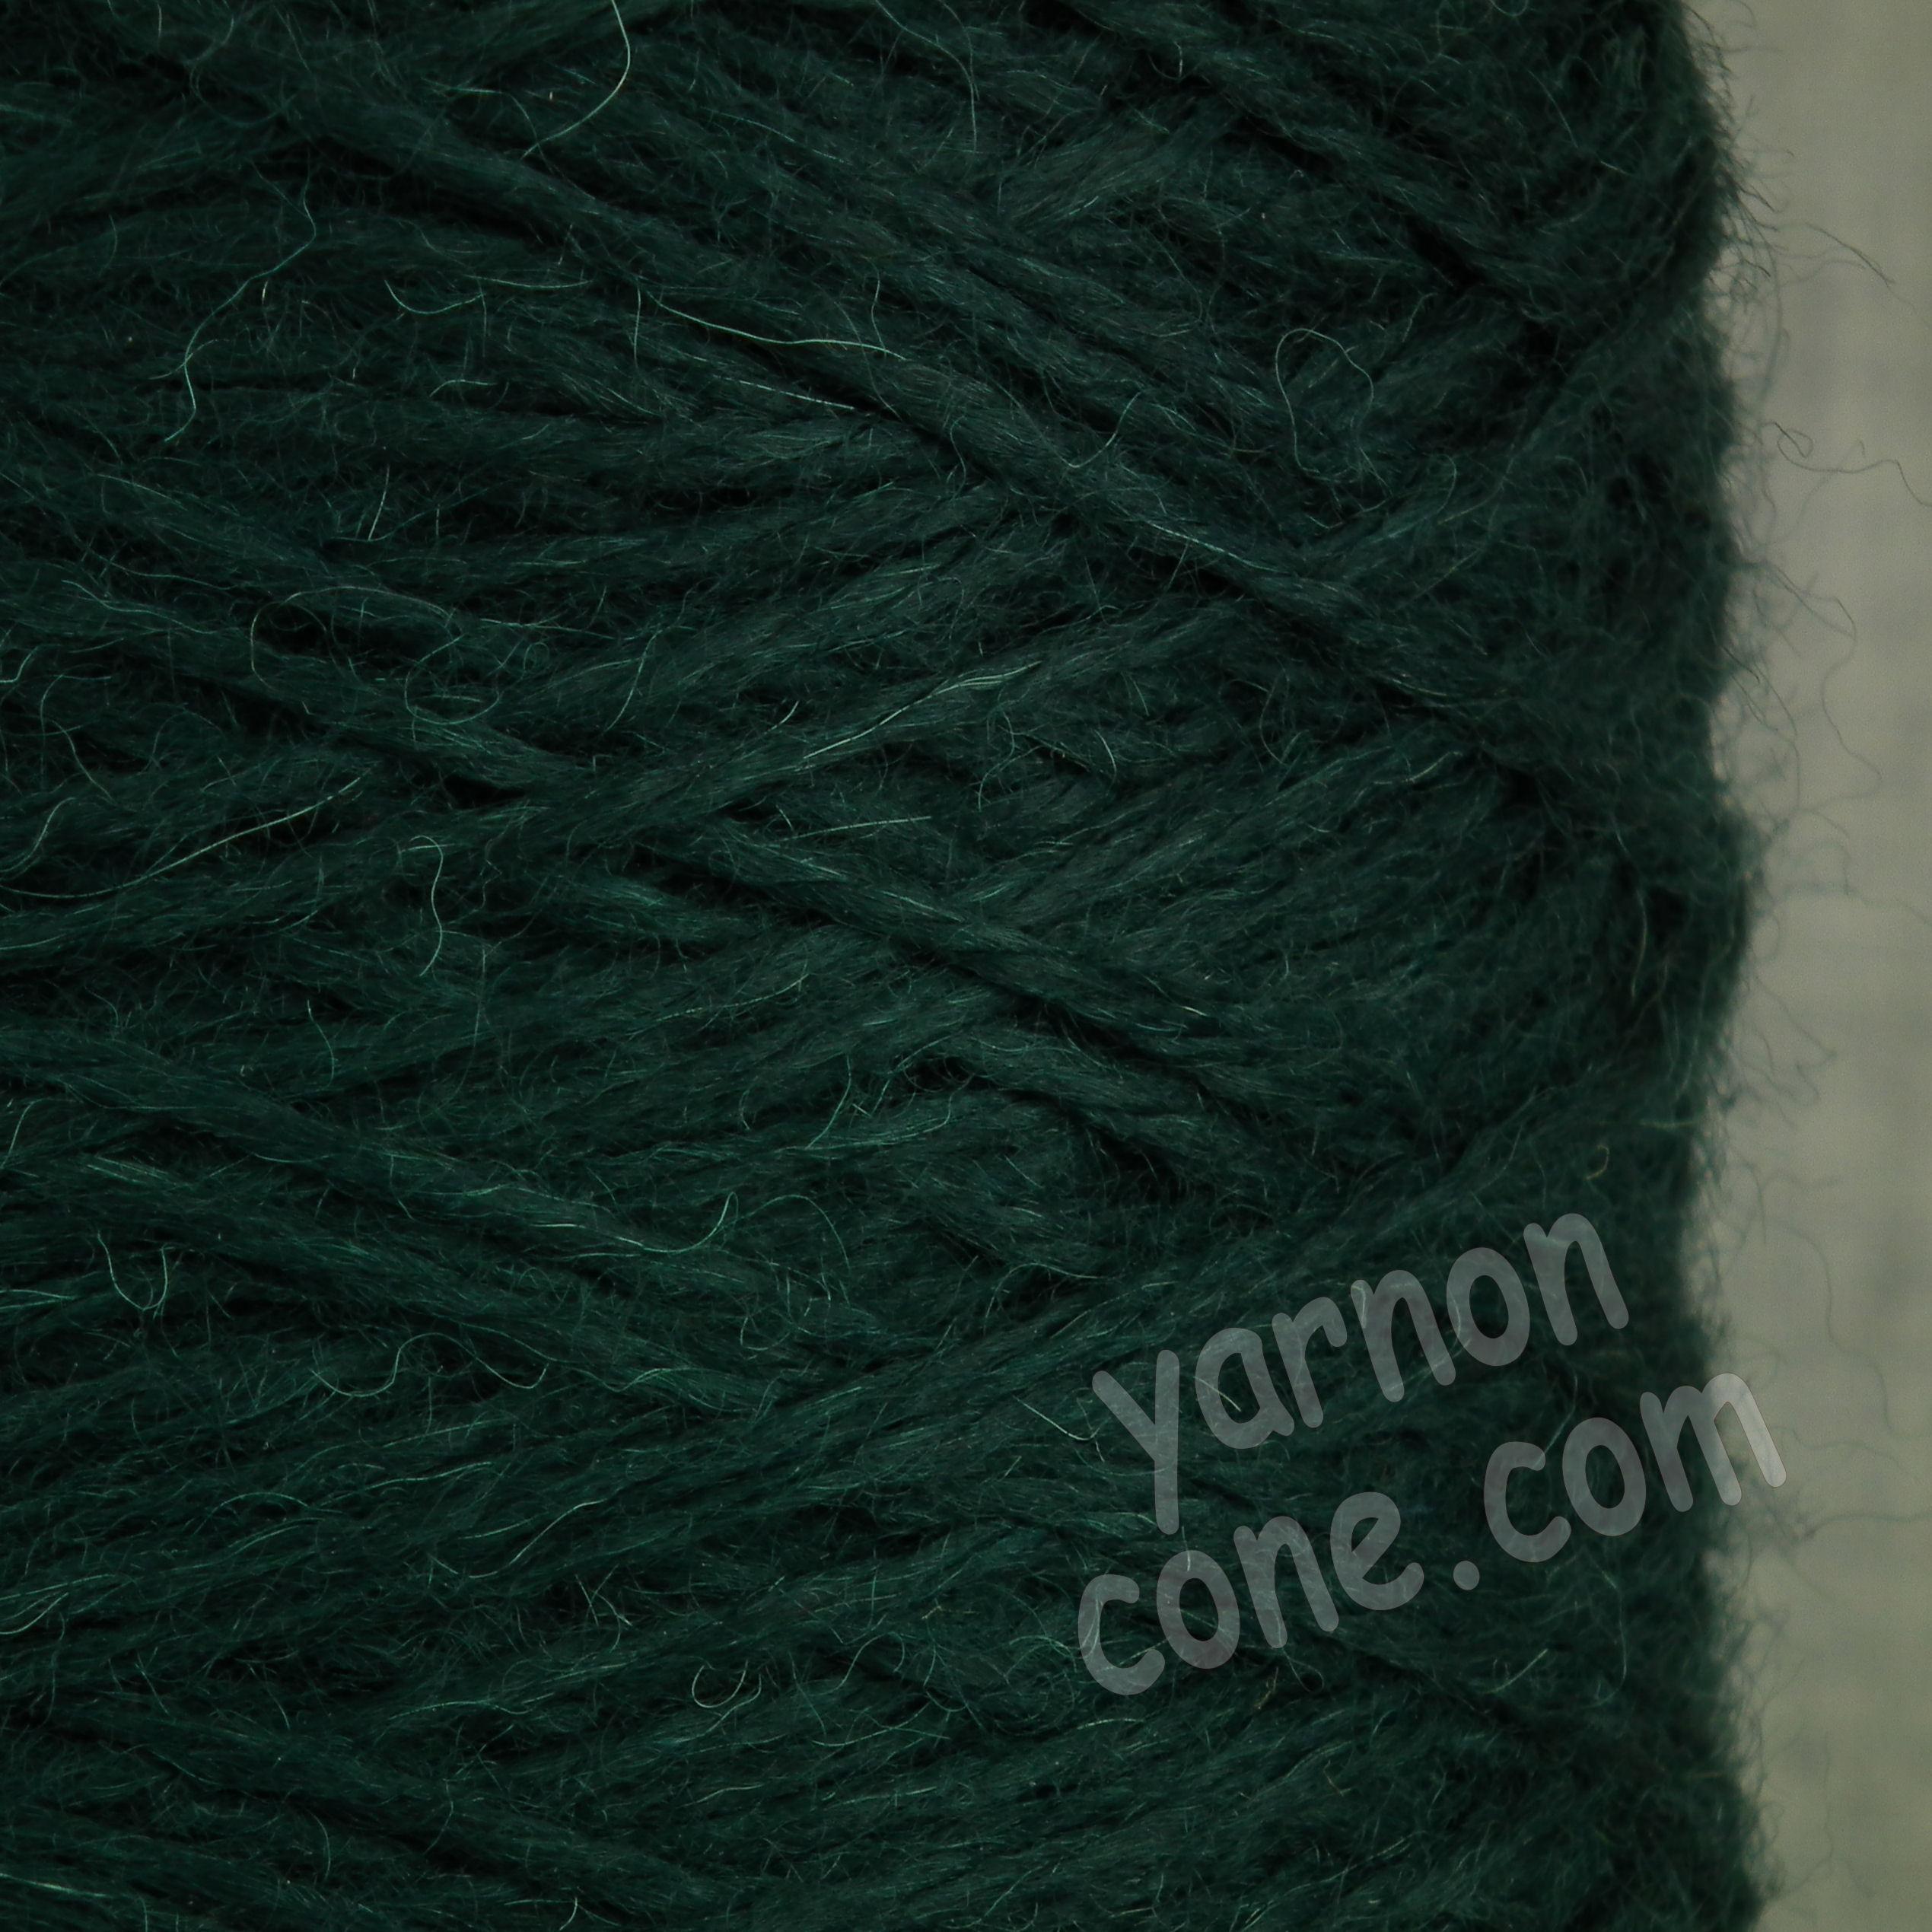 alpaca merino wool yarn aran weight soft knitting spruce green dark